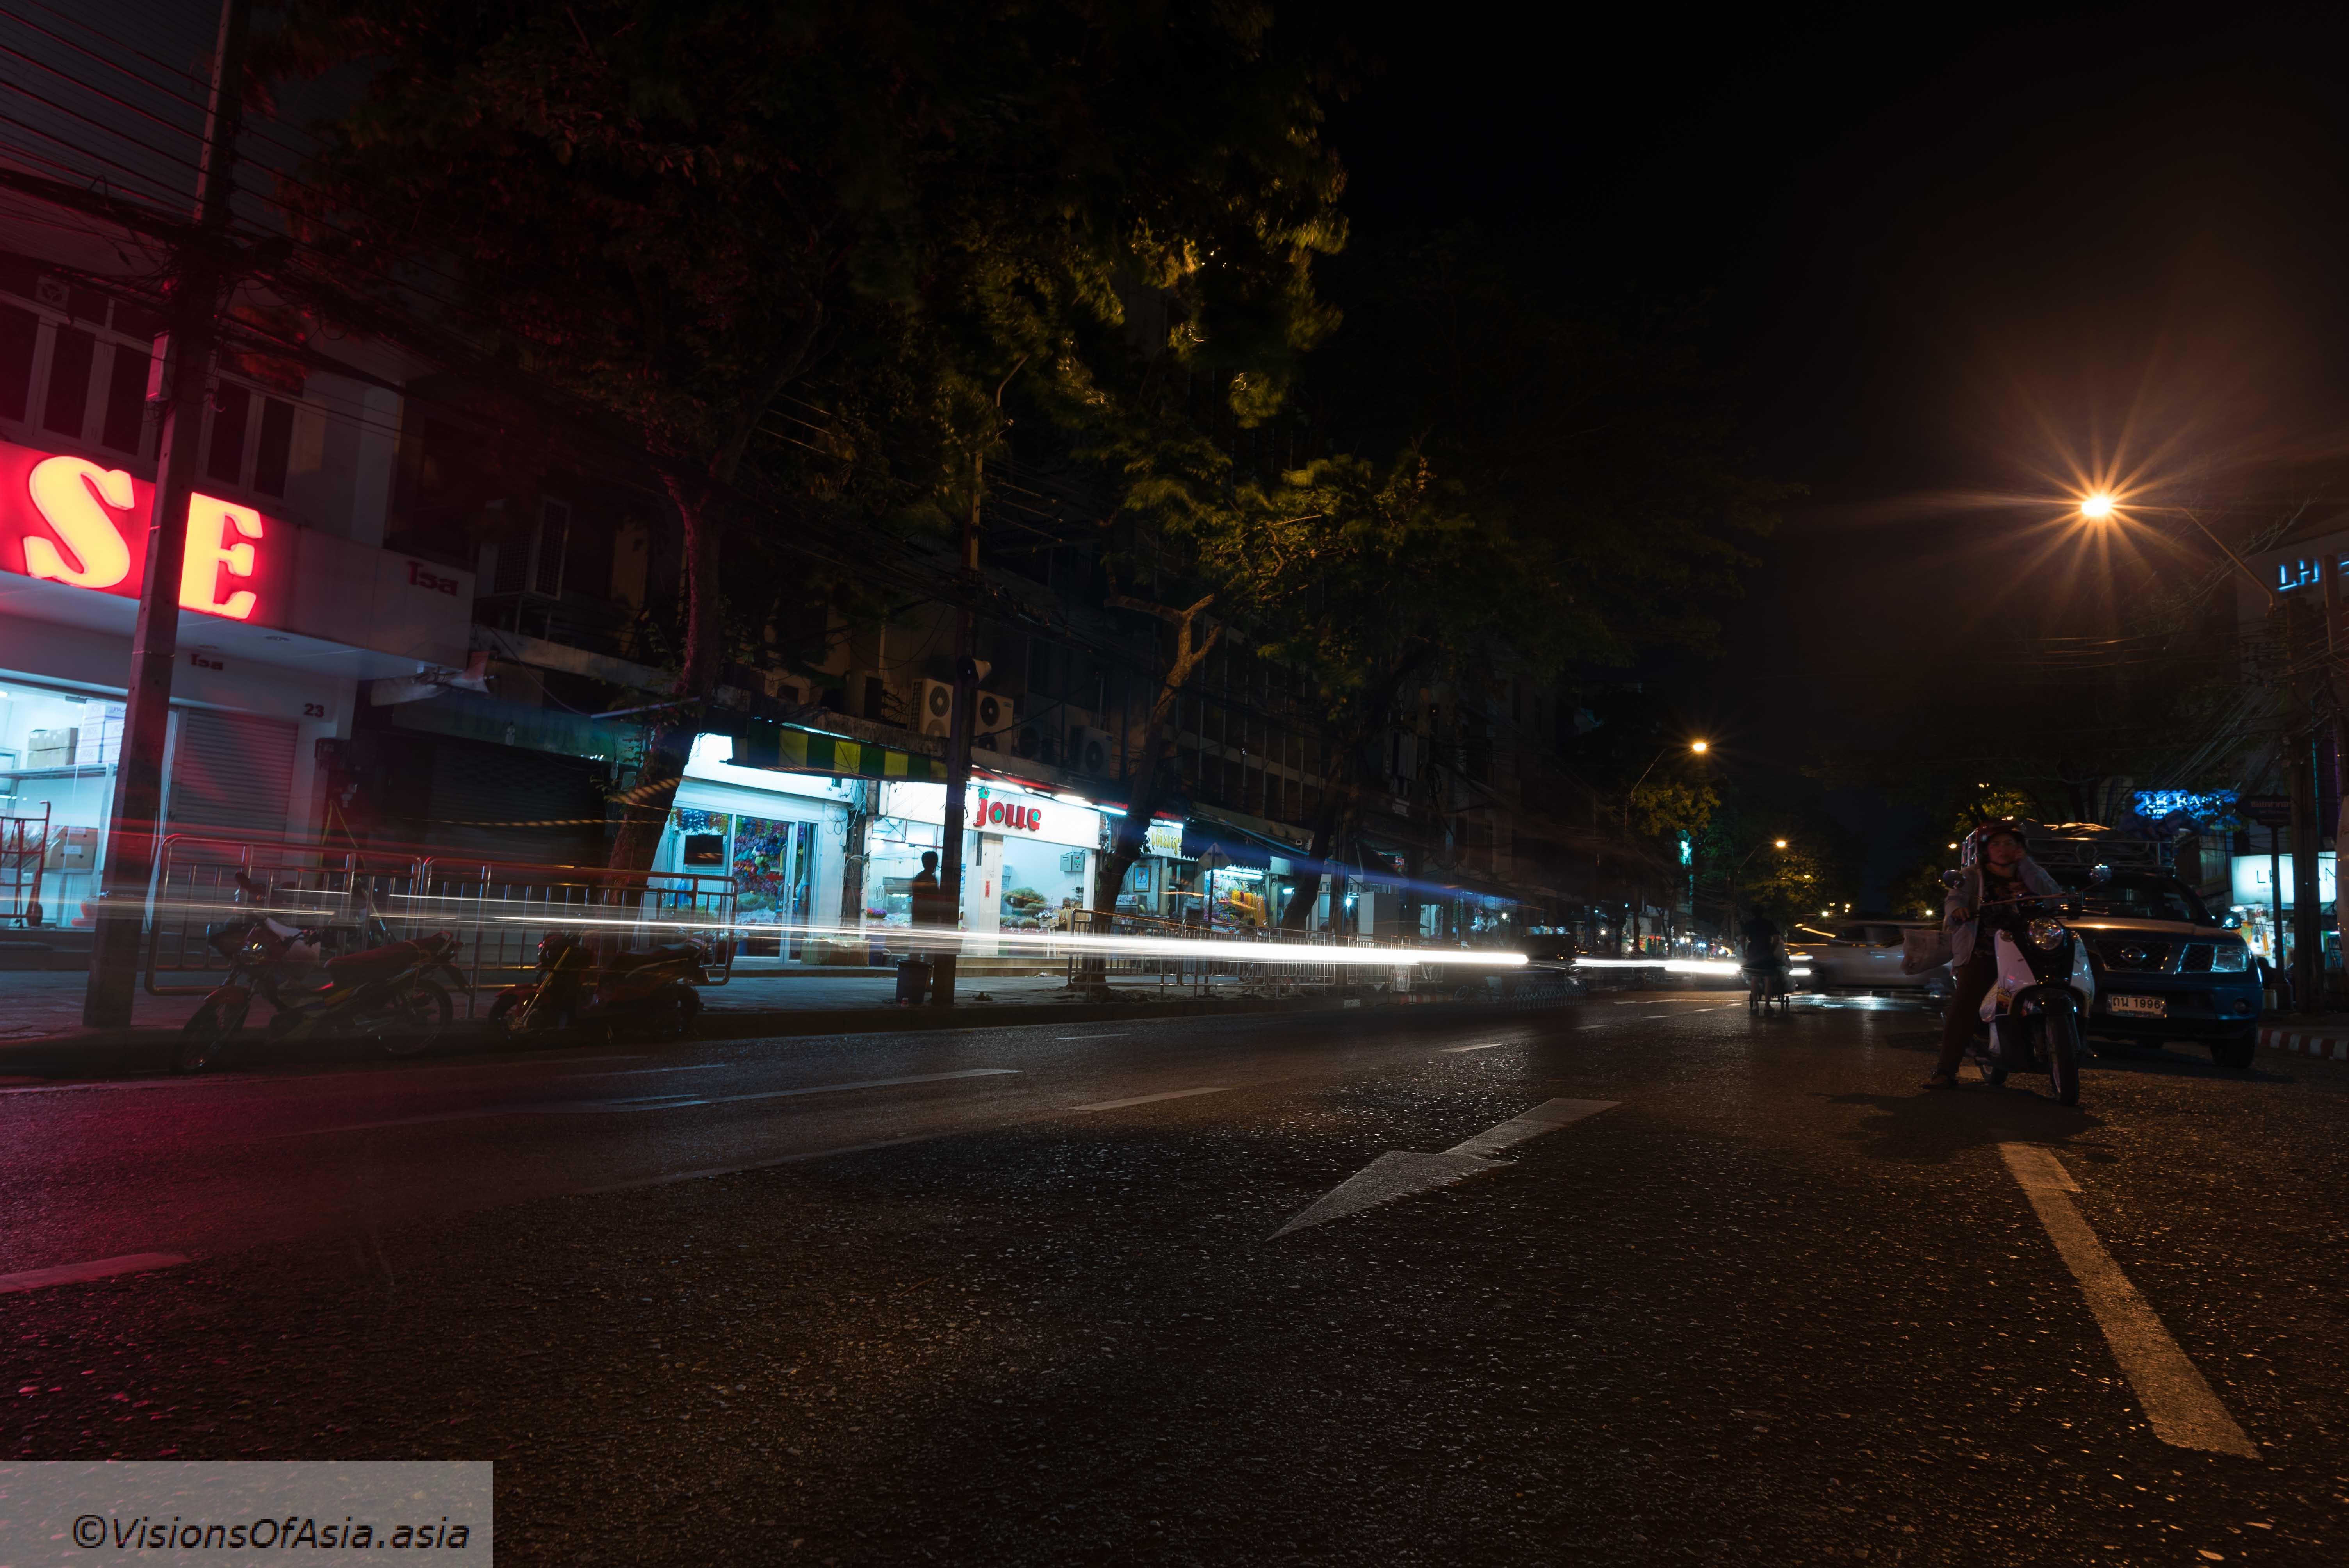 Dark and empty street